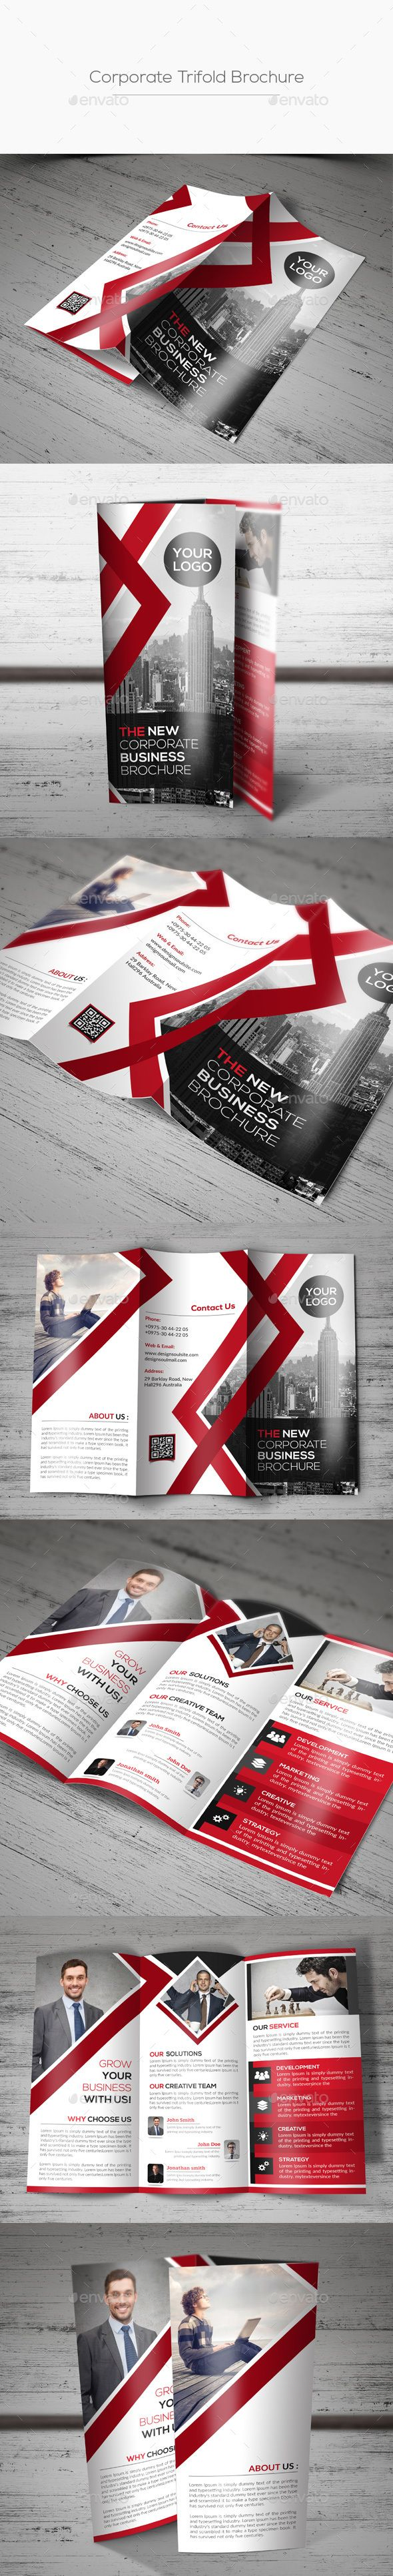 Corporate Trifold Brochure Template PSD #design Download: http://graphicriver.net/item/corporate-trifold-brochure/13418637?ref=ksioks